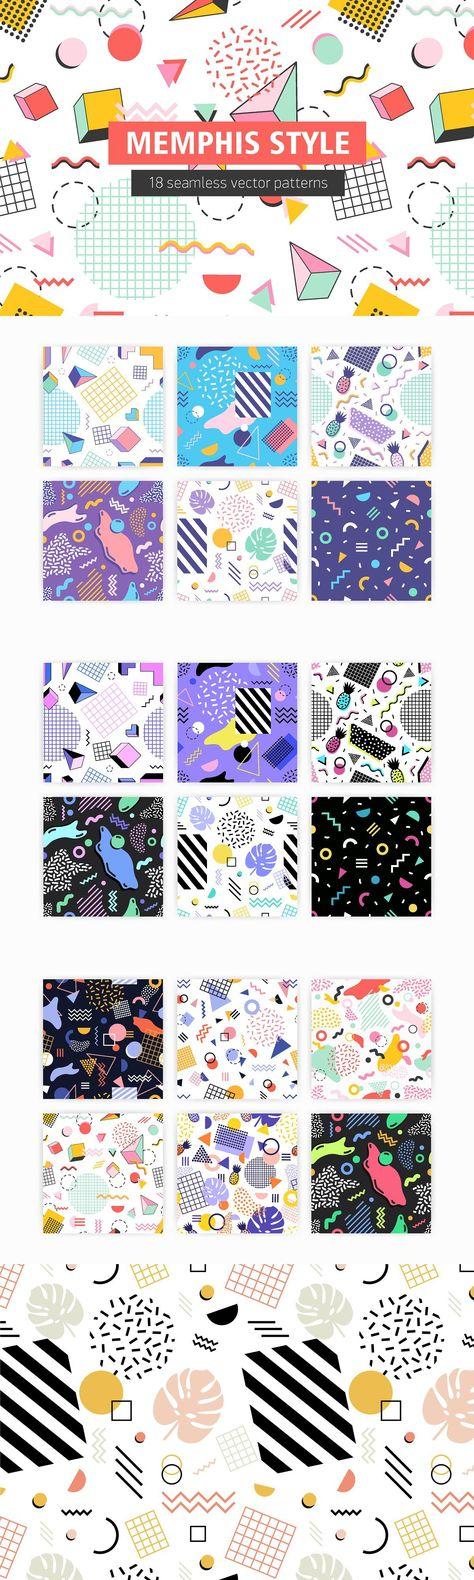 Abstract memphis semless patterns